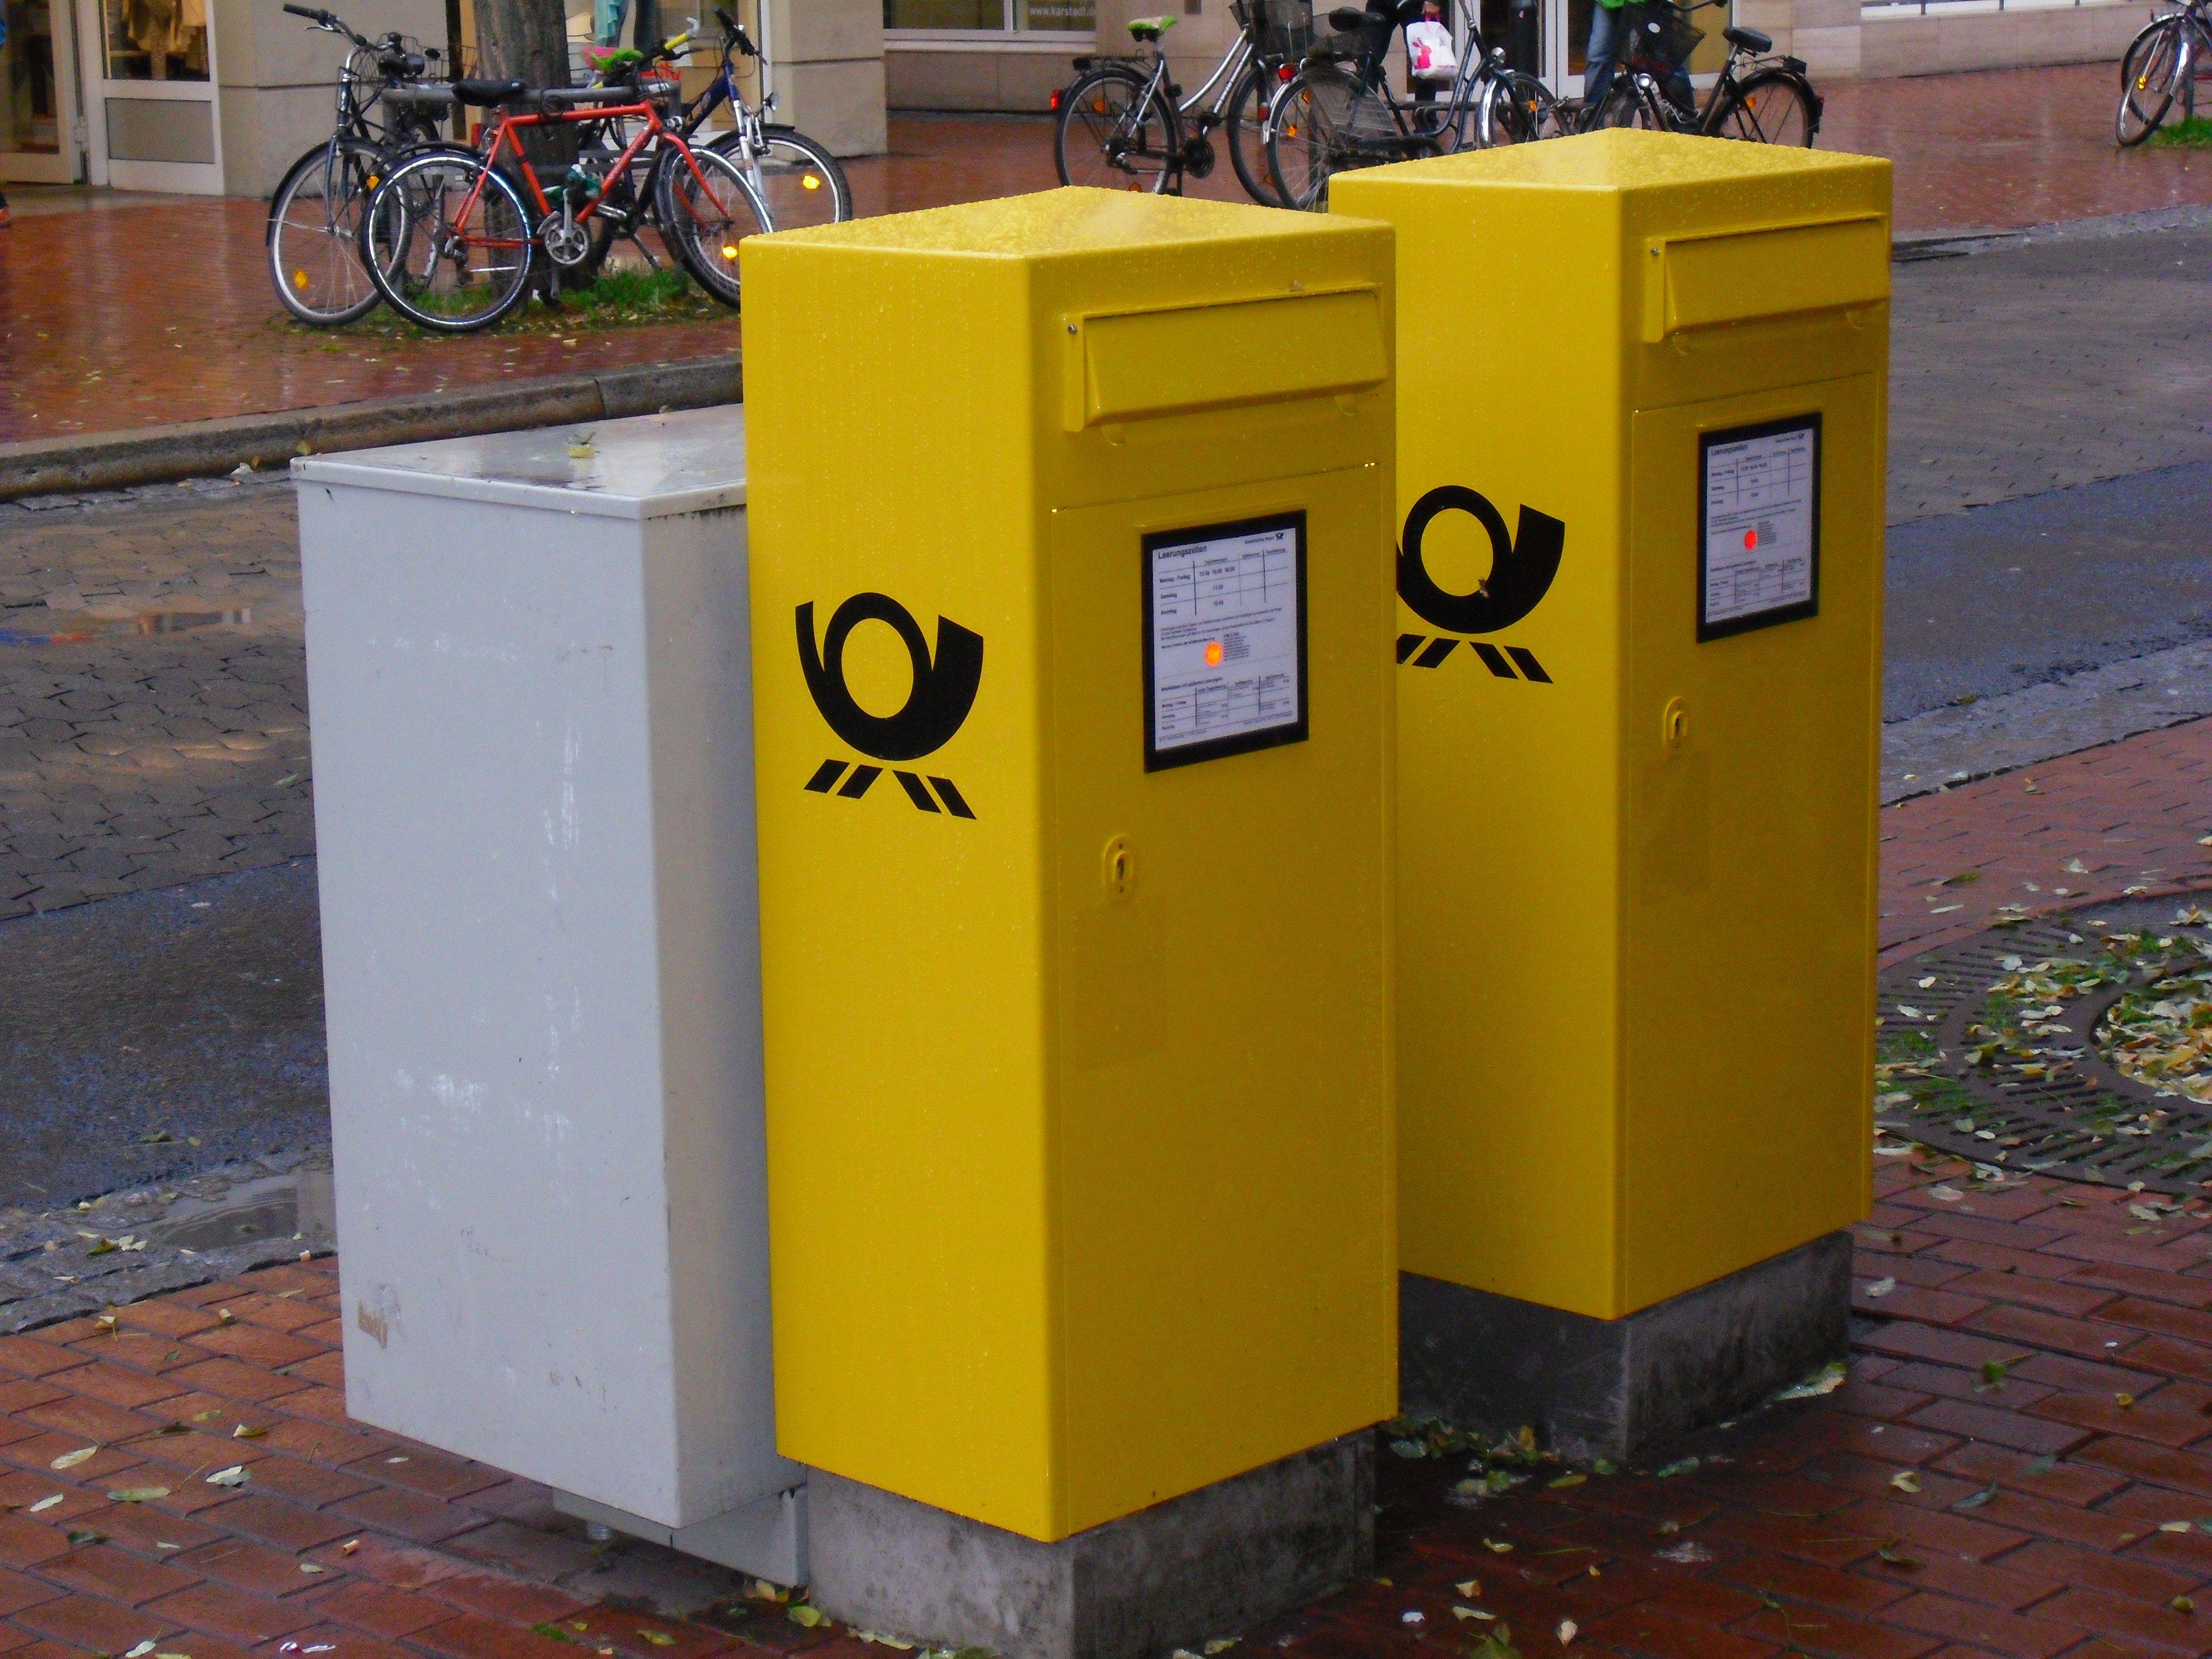 Göttingen (Lower Saxony), Germany: free standing post boxes with one input; 3. November 2012 (Foto: Michael Kuschkowitz)